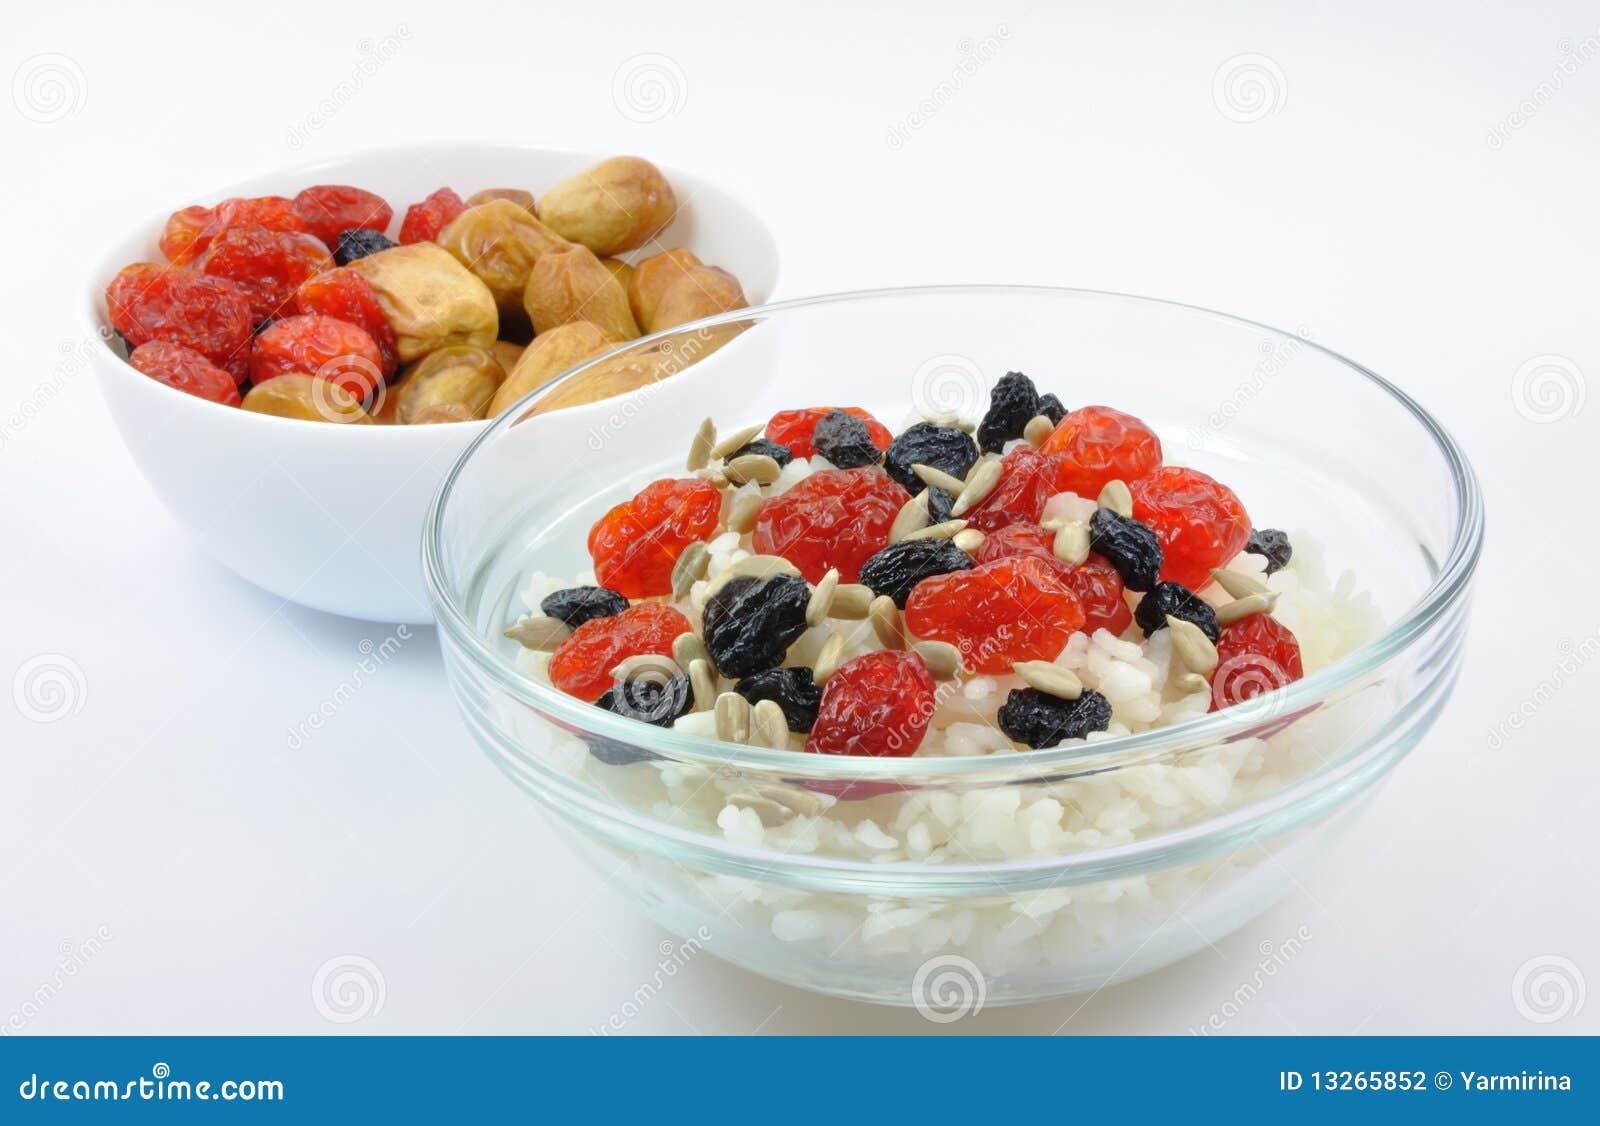 dried fruit fruit bowls